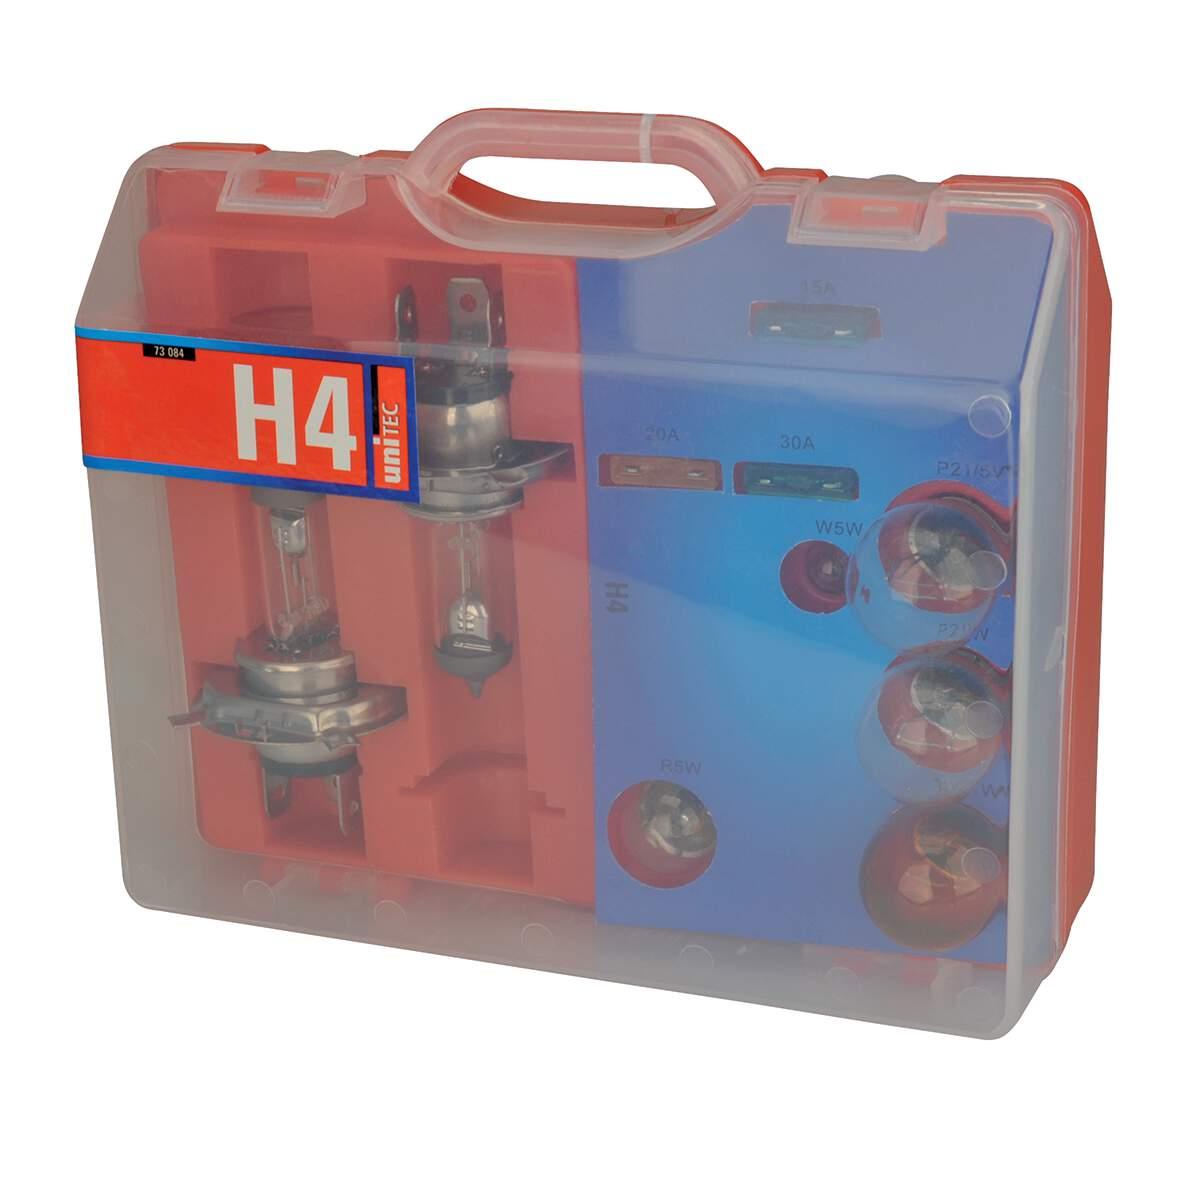 Unitec H7 Ersatzlampen-Koffer 55 W